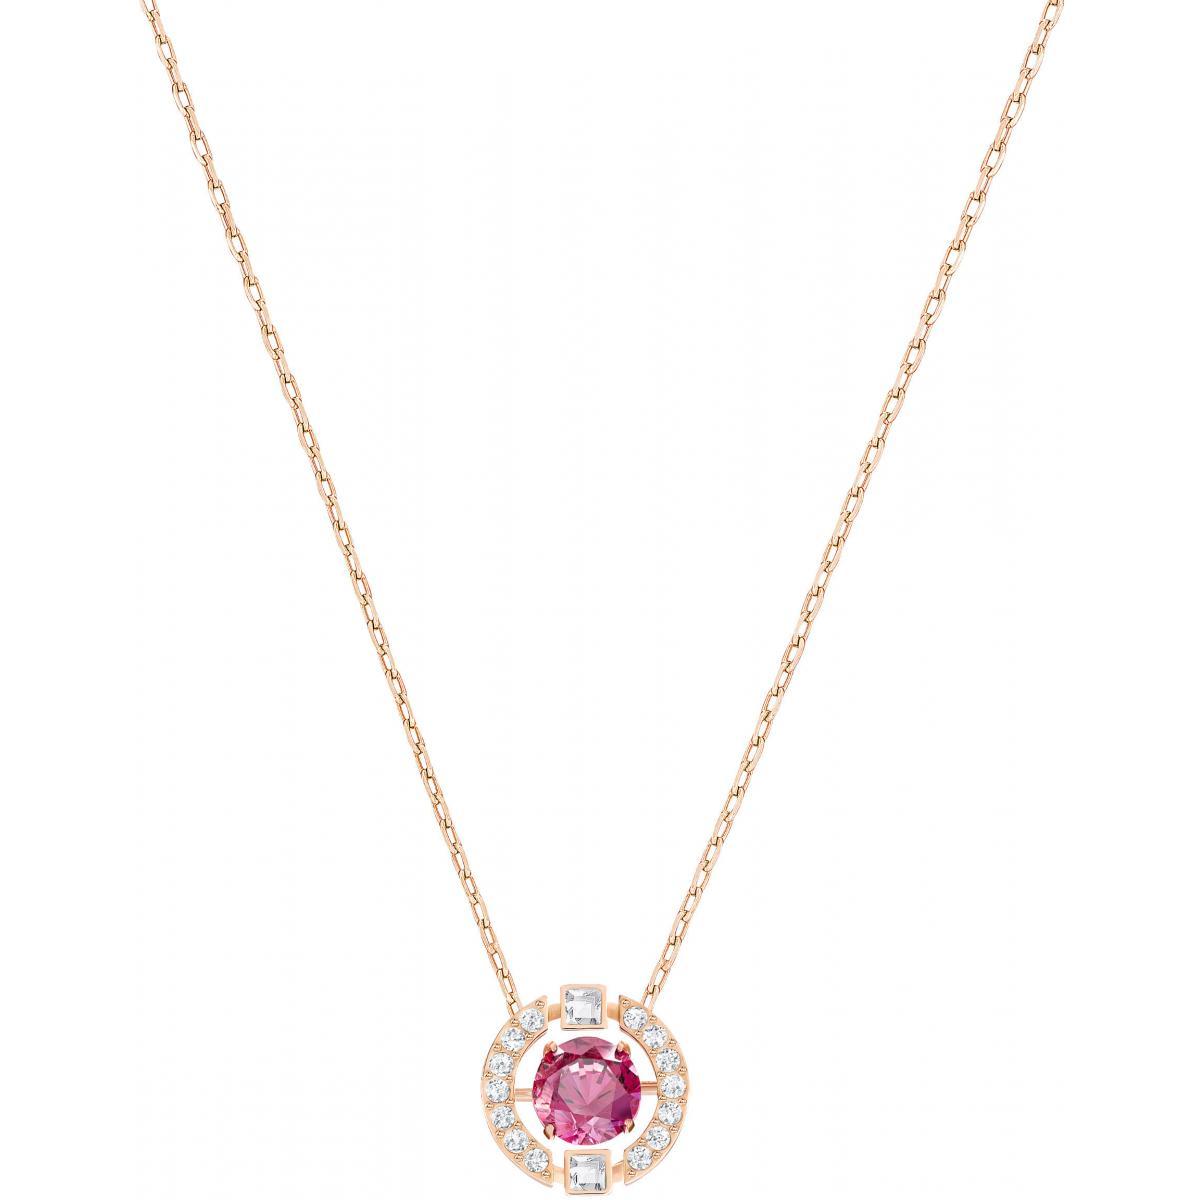 Collier et pendentif Swarovski Bijoux 5279421 - Acier Cristal Rose Femme